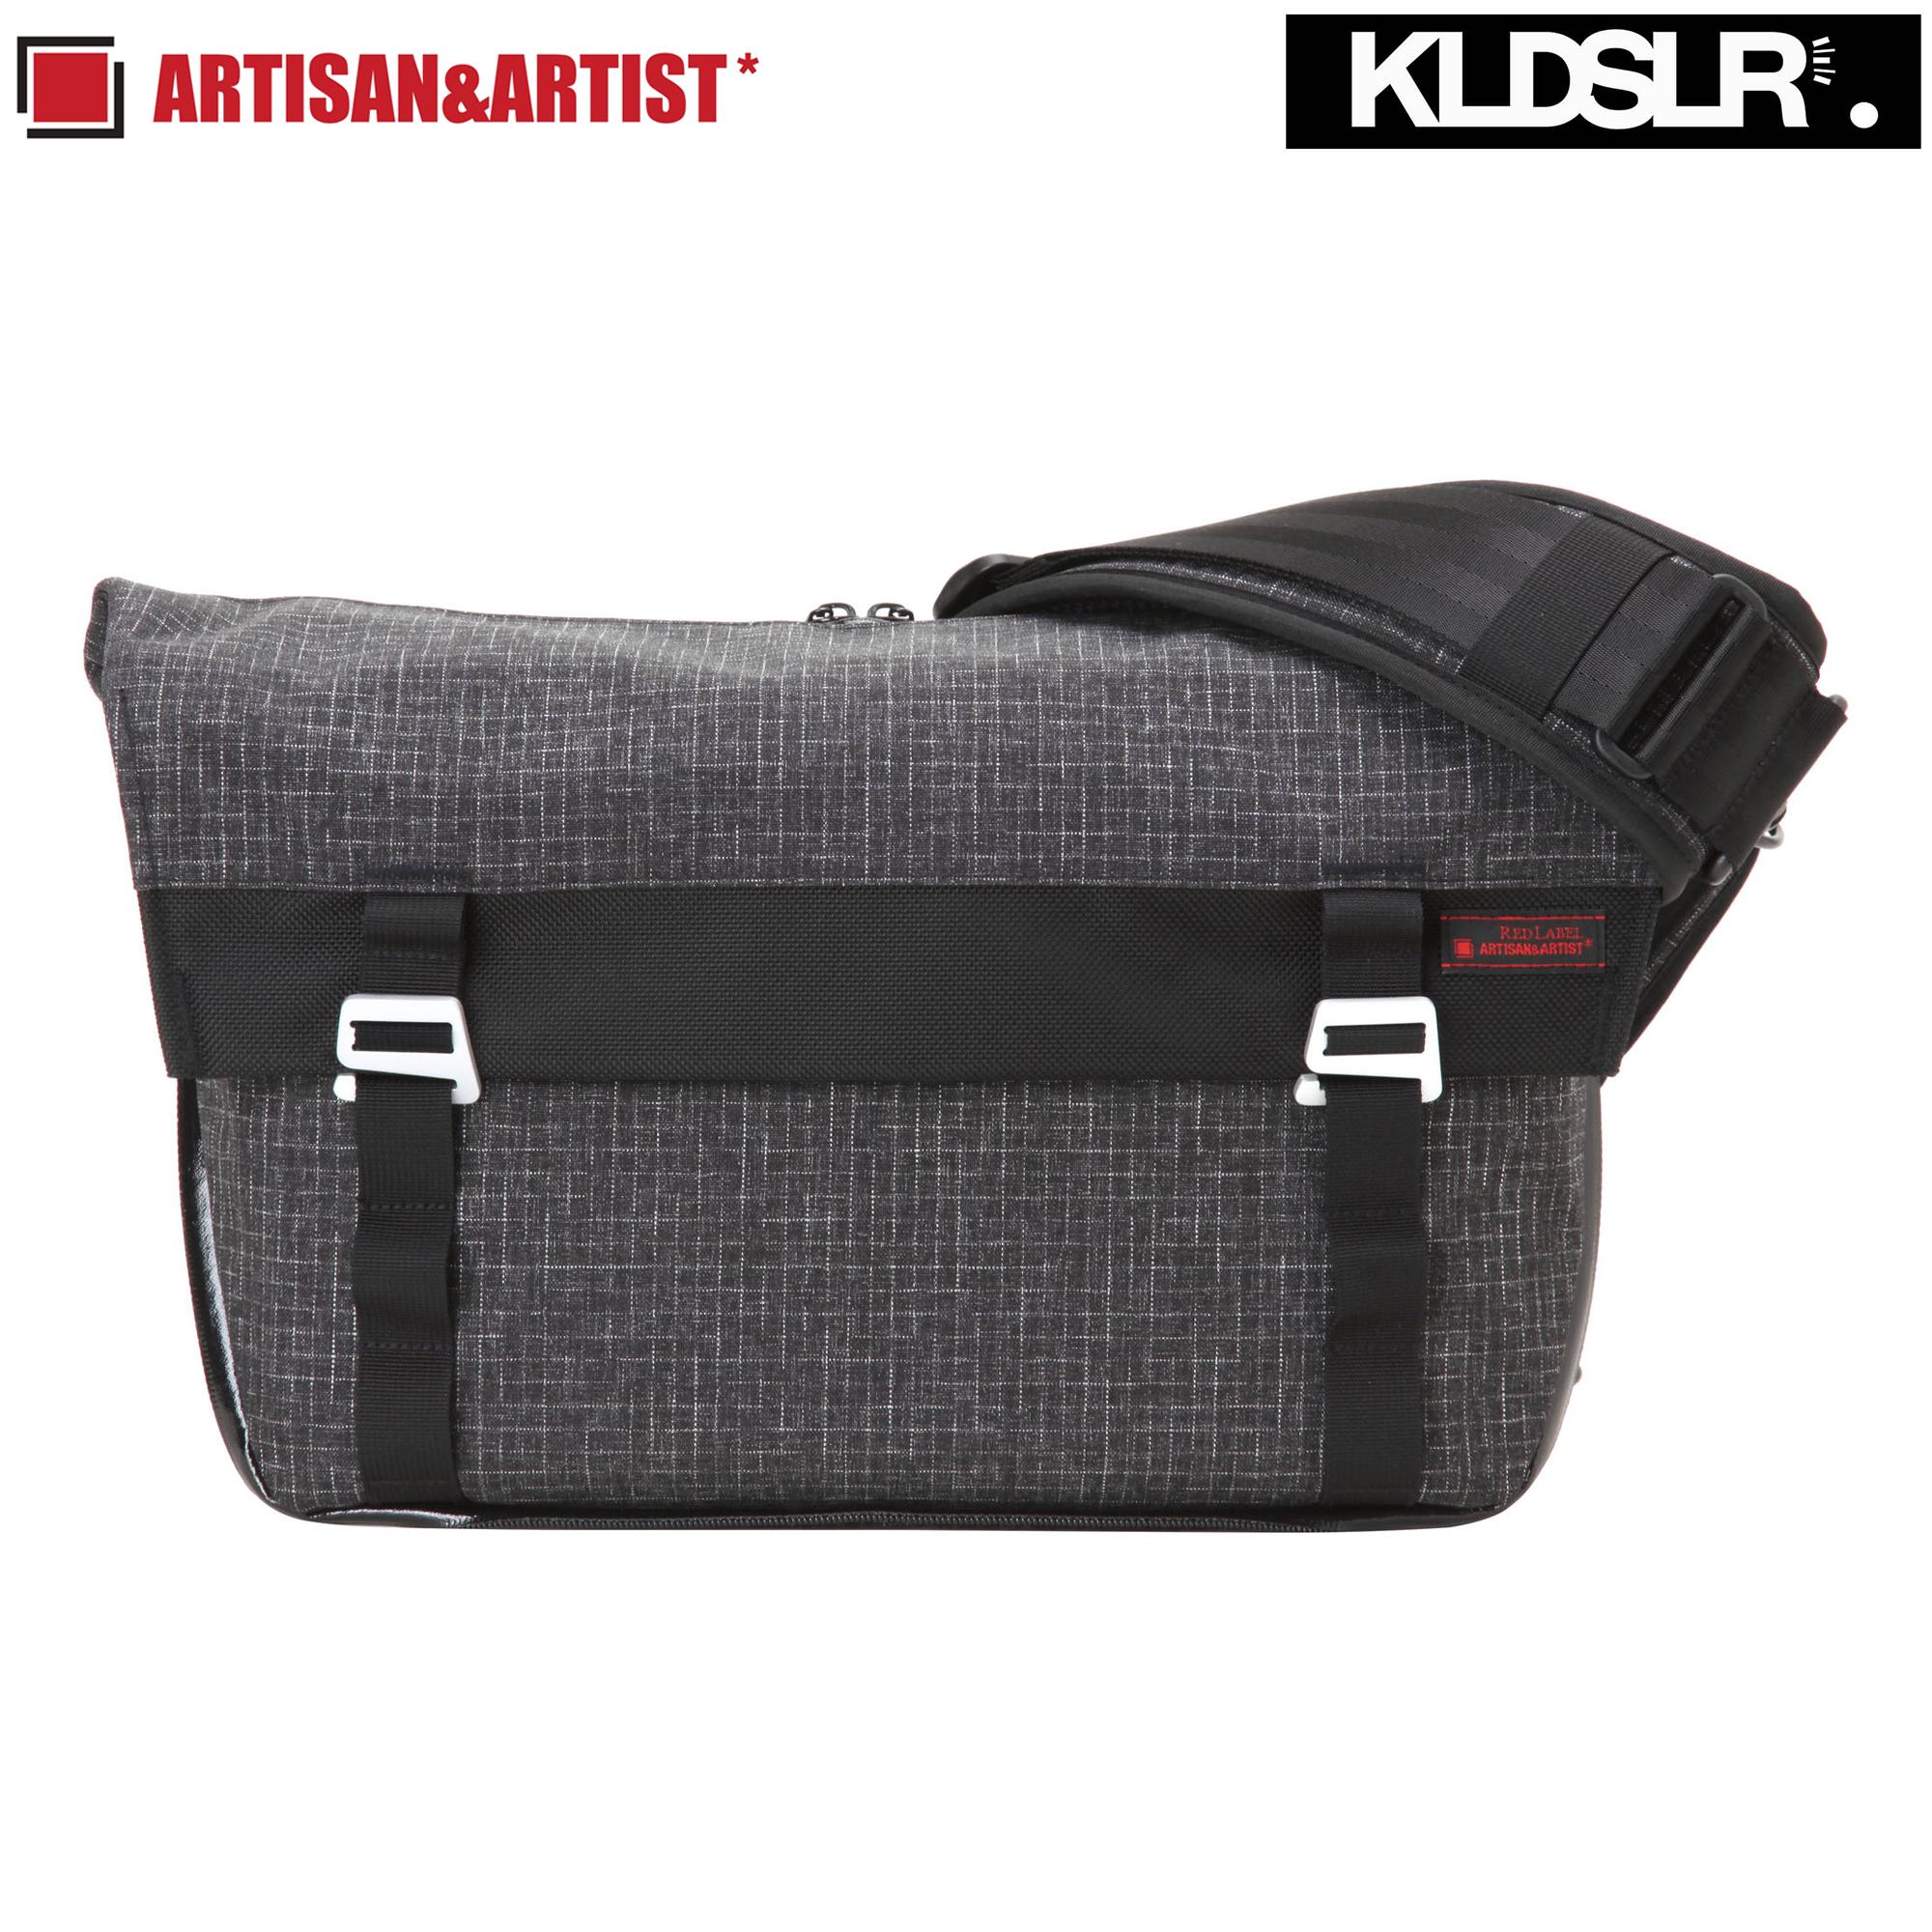 Artisan Artist Messenger Bag Rdb Mg100 Grey Lowepro Dashpoint Avc 40 Ii Black